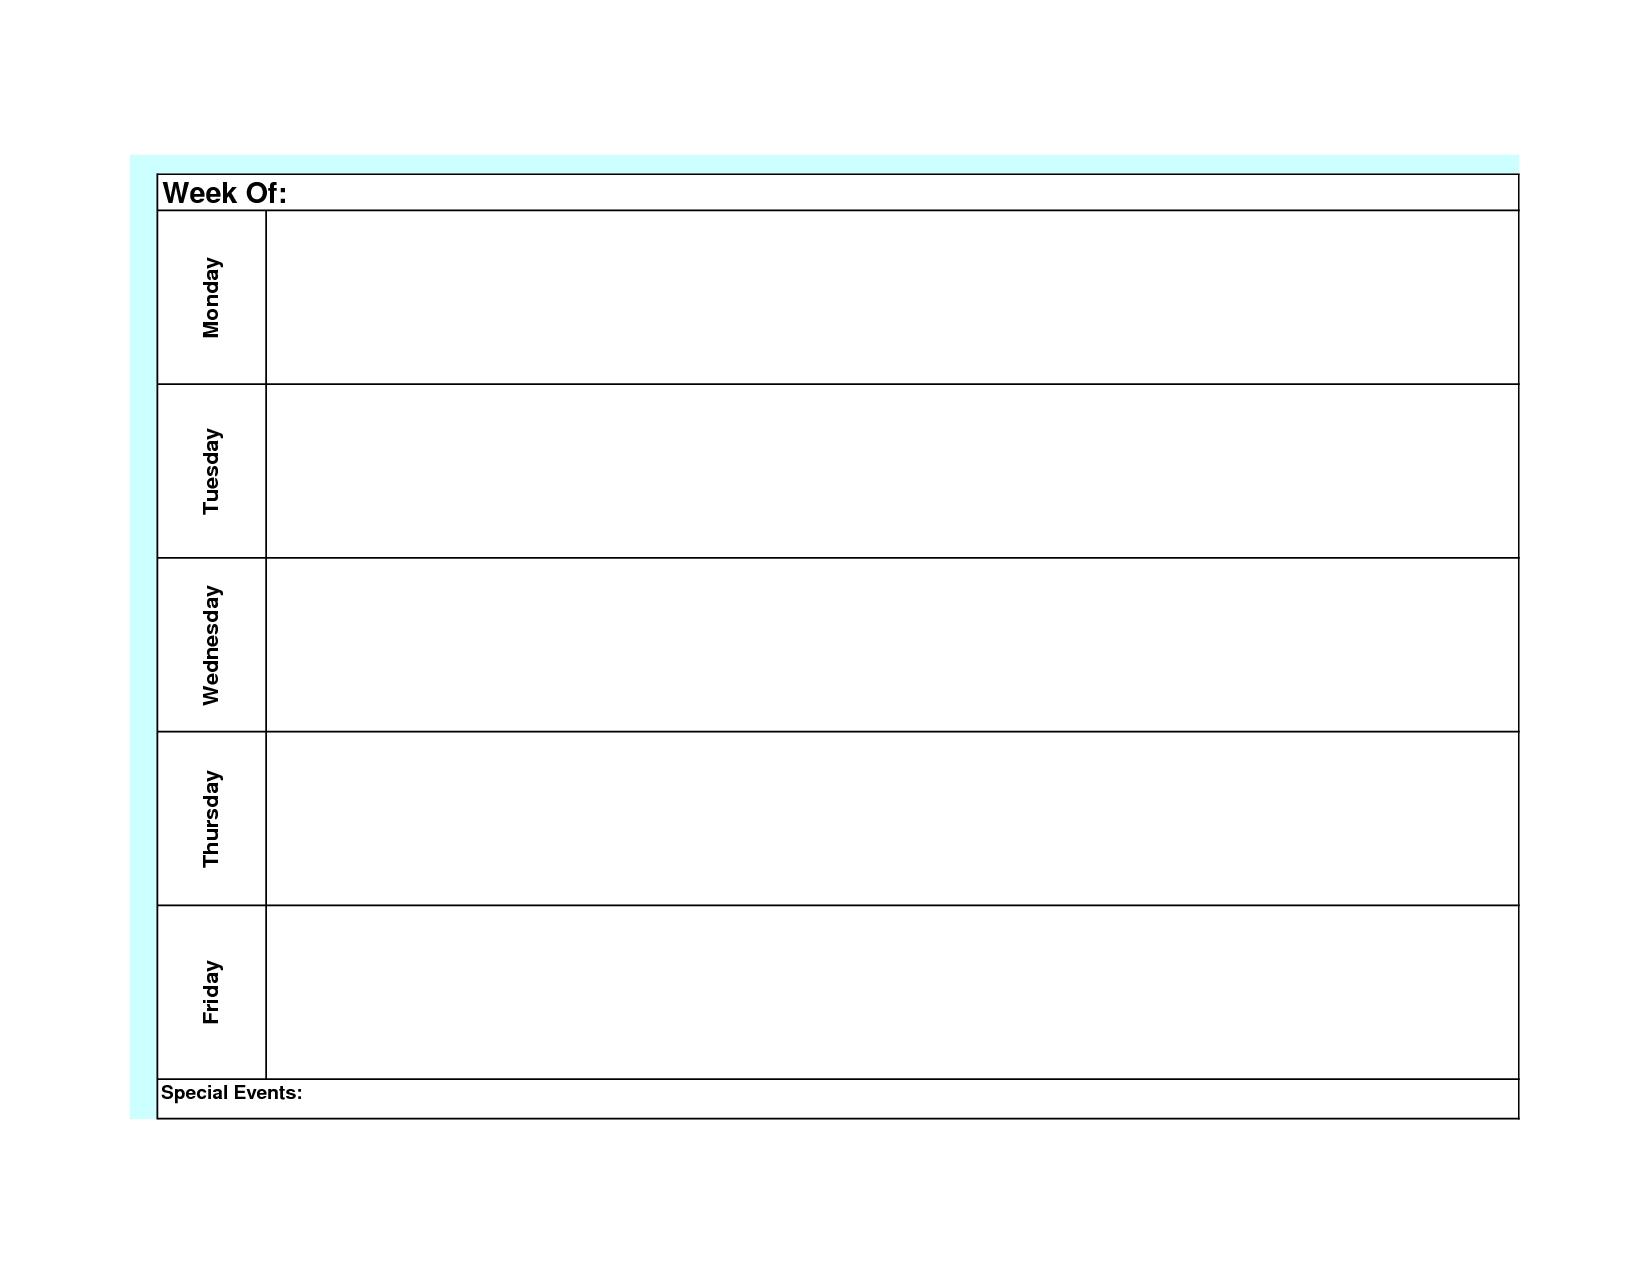 Blank Weekly Calendar Template Monday Friday | Planner-Monday To Friday Blank Calendar